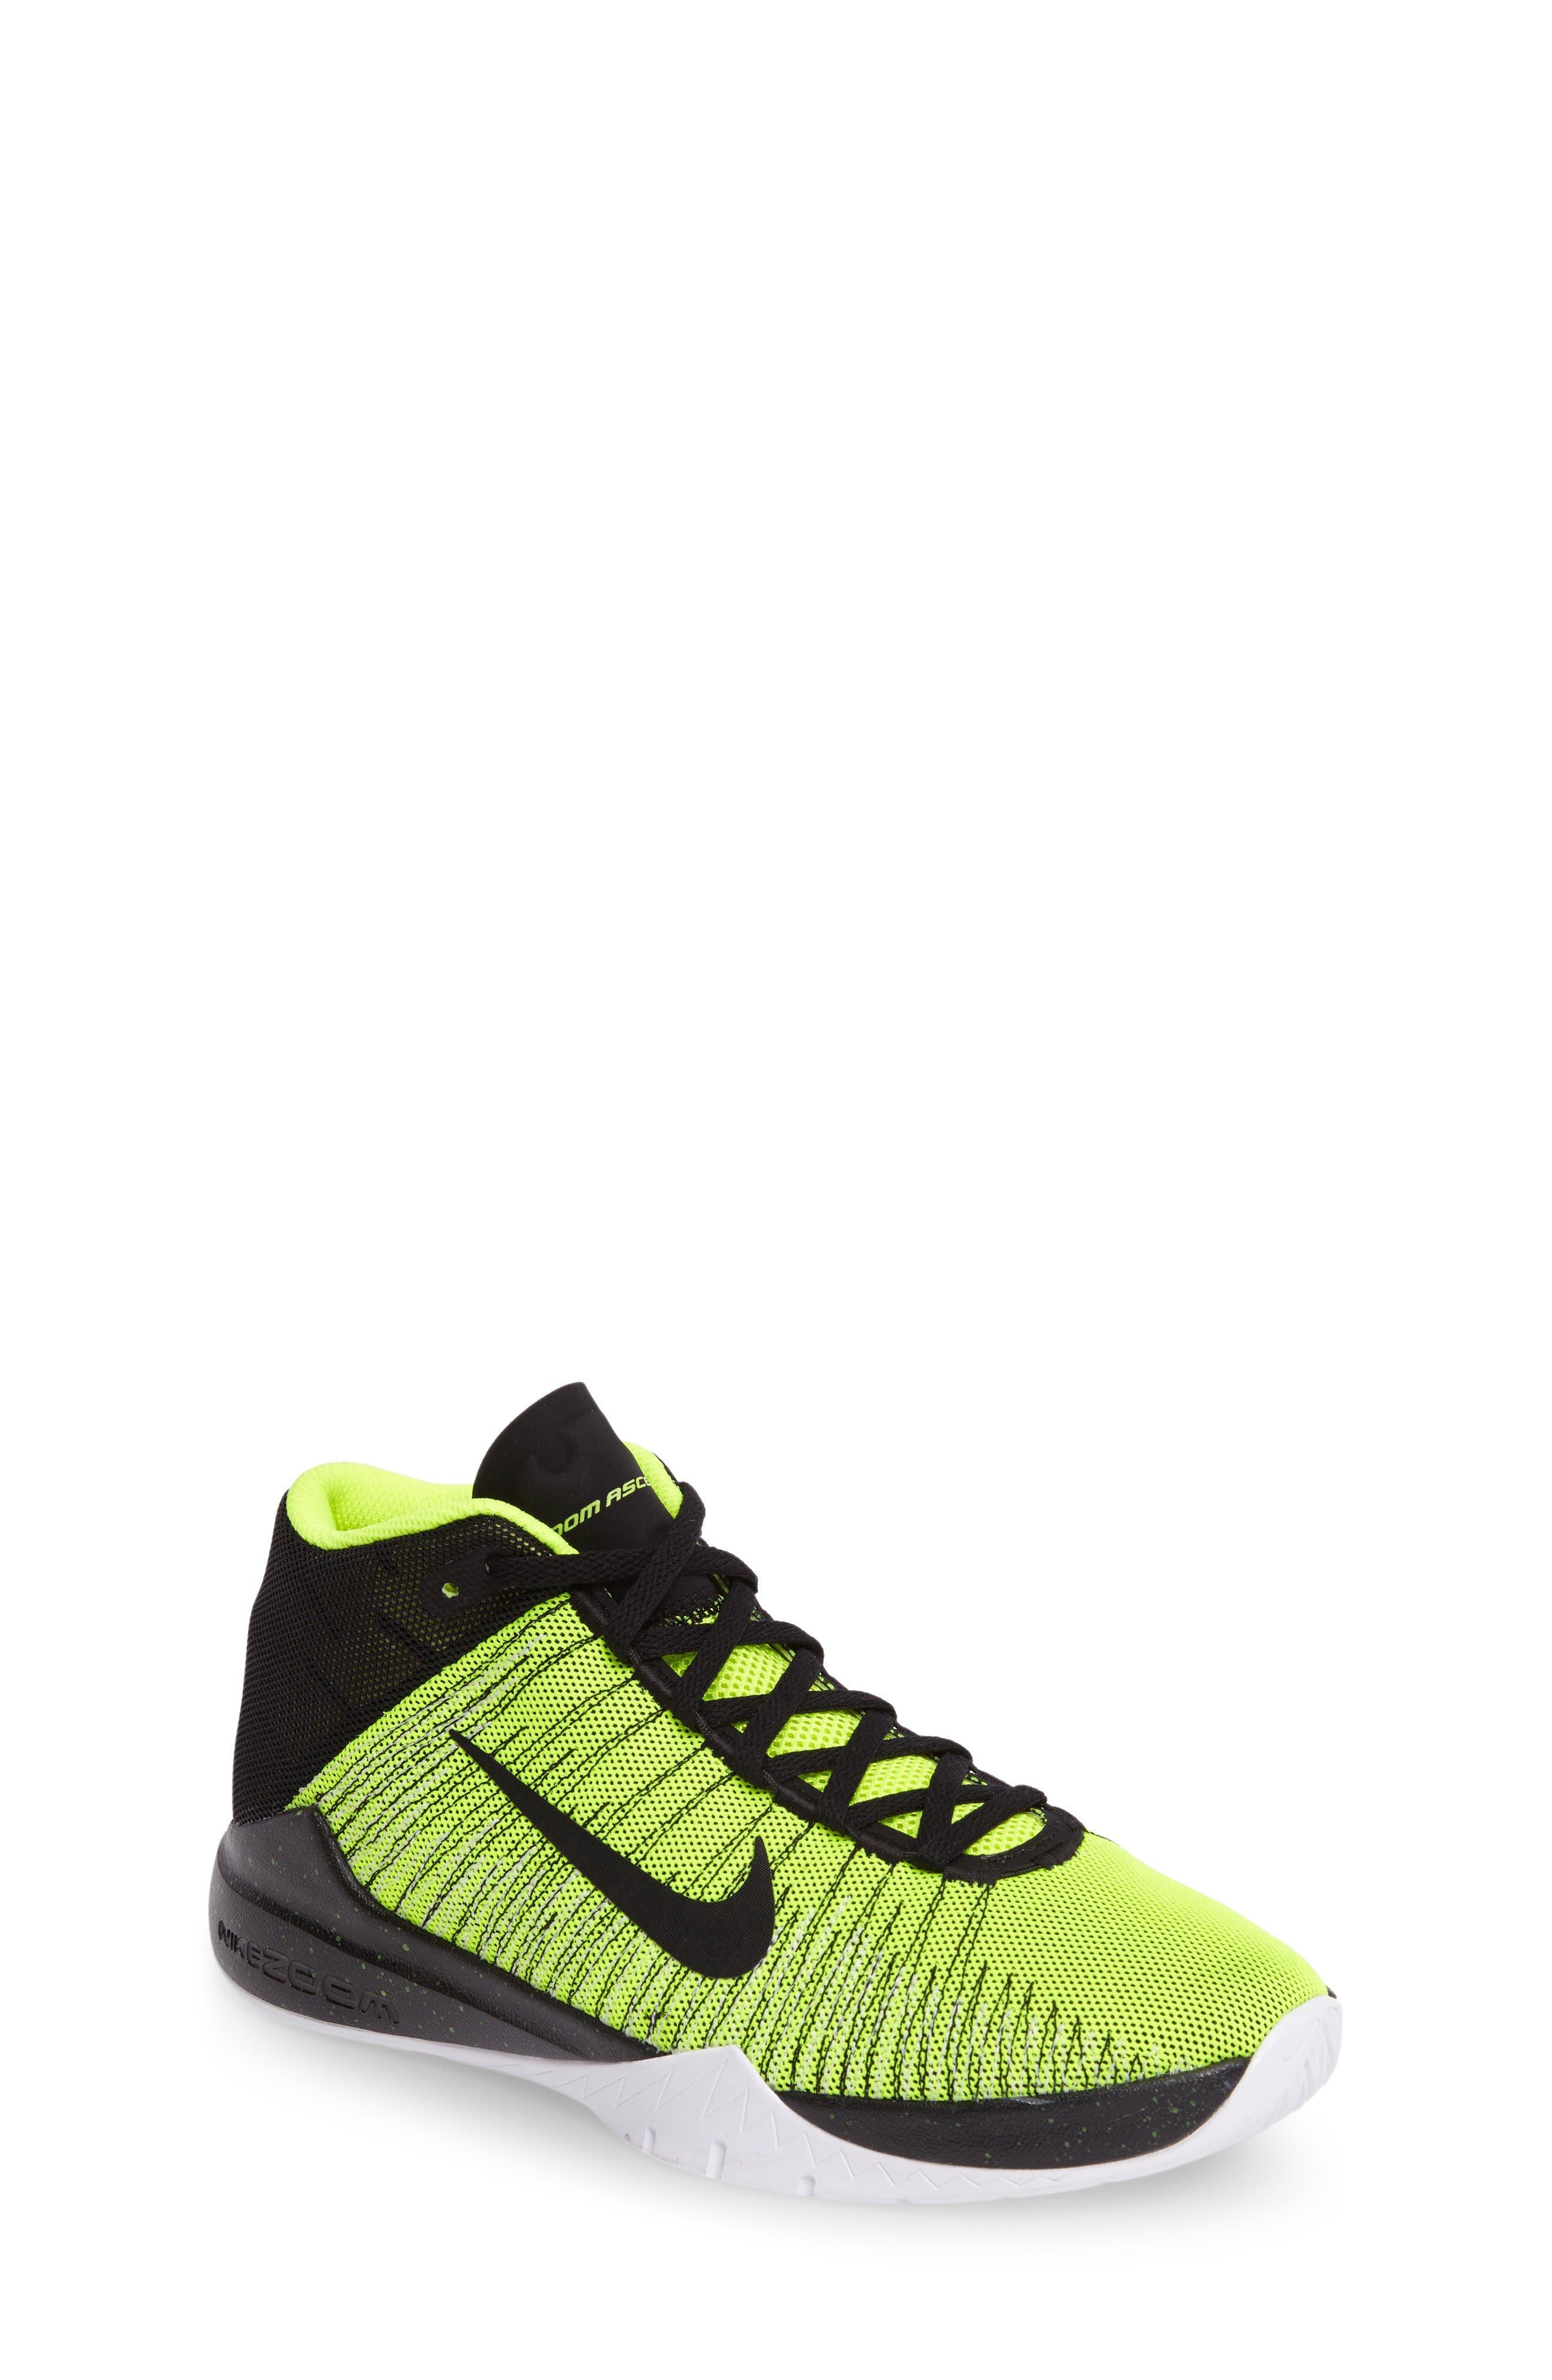 Main Image - Nike 'Zoom Ascension' High Top Basketball Shoe ...